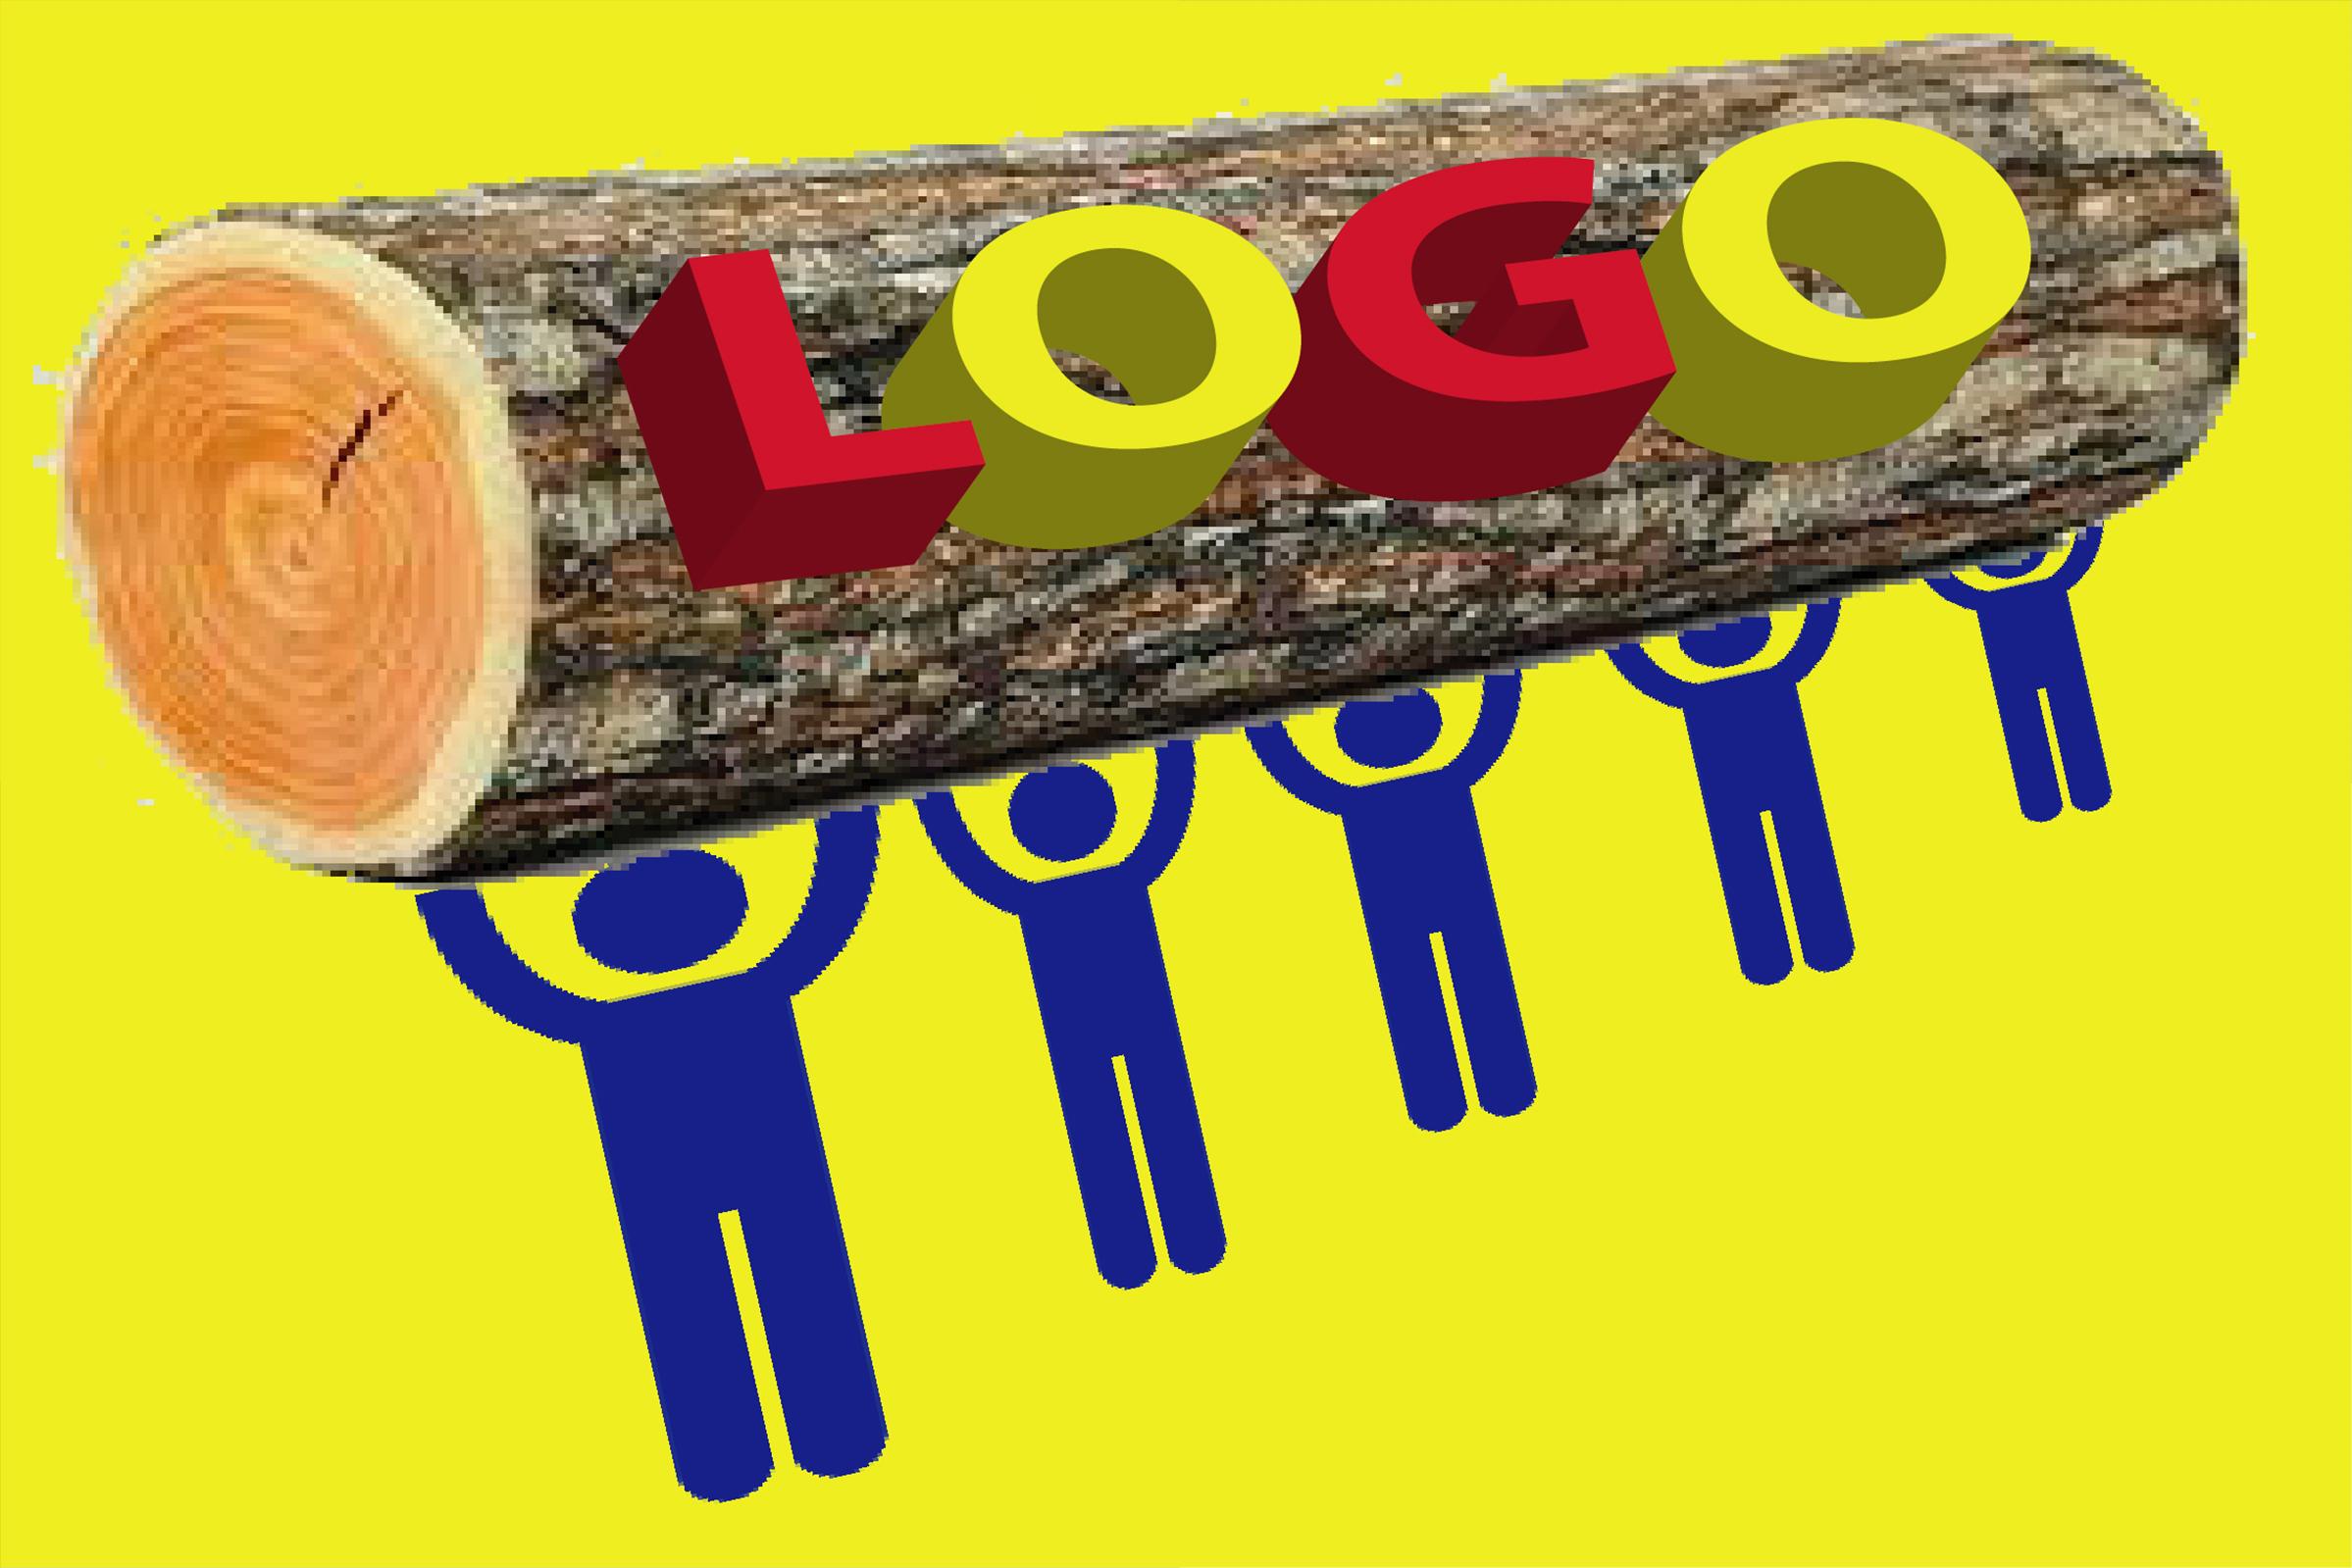 i will Do modern minimalist flat logo design in 24 hours